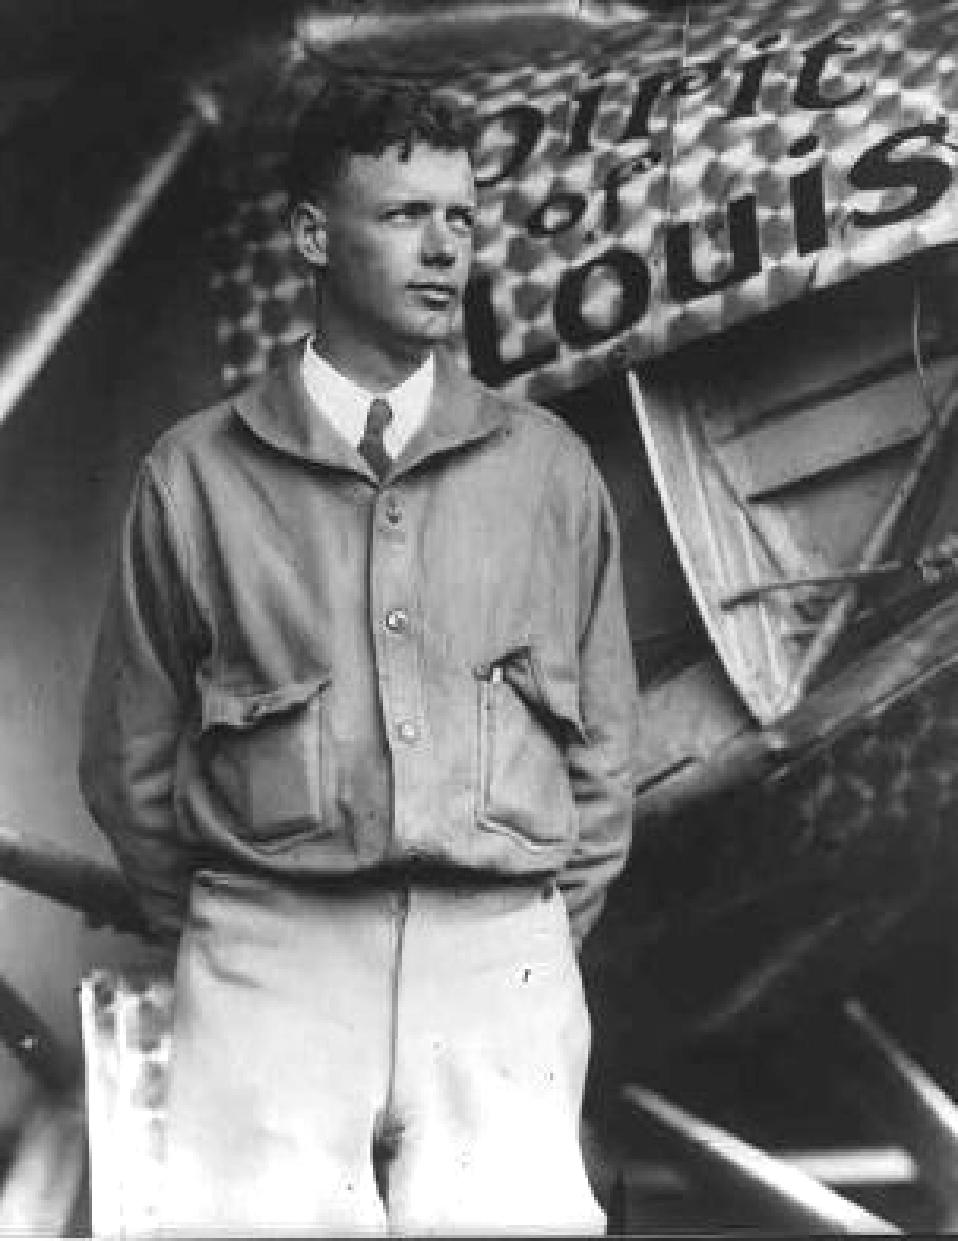 Charles Lindbergh | Flight, Biography, Facts, & Accomplishments ...